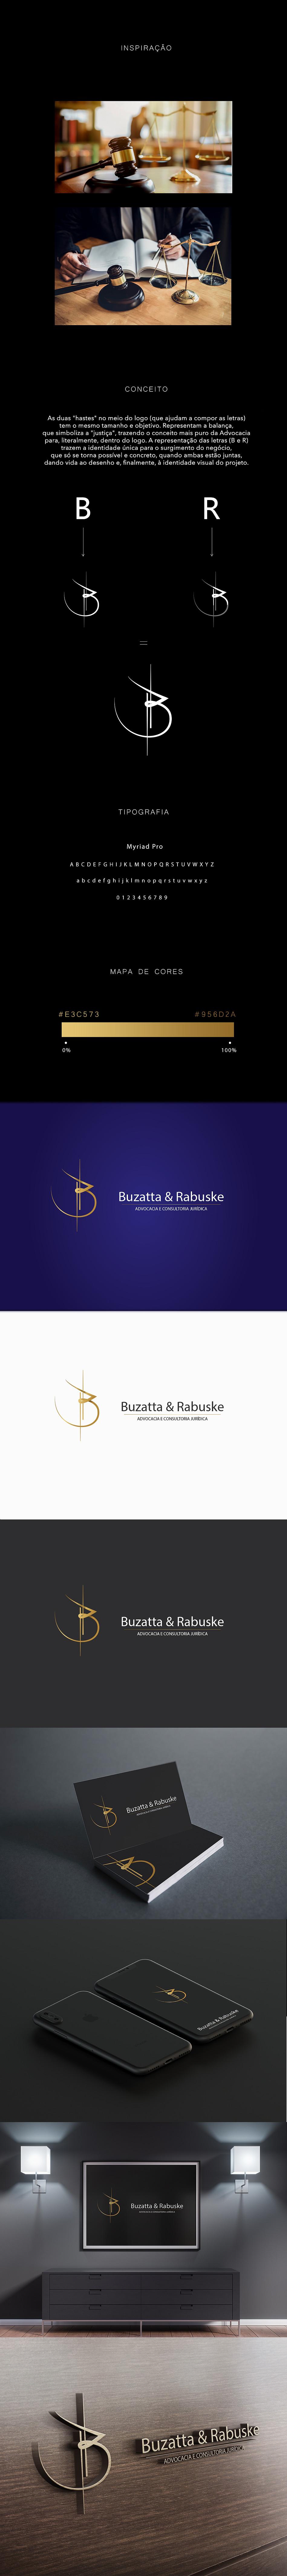 Buzatta & Rabuske apresentação.jpg